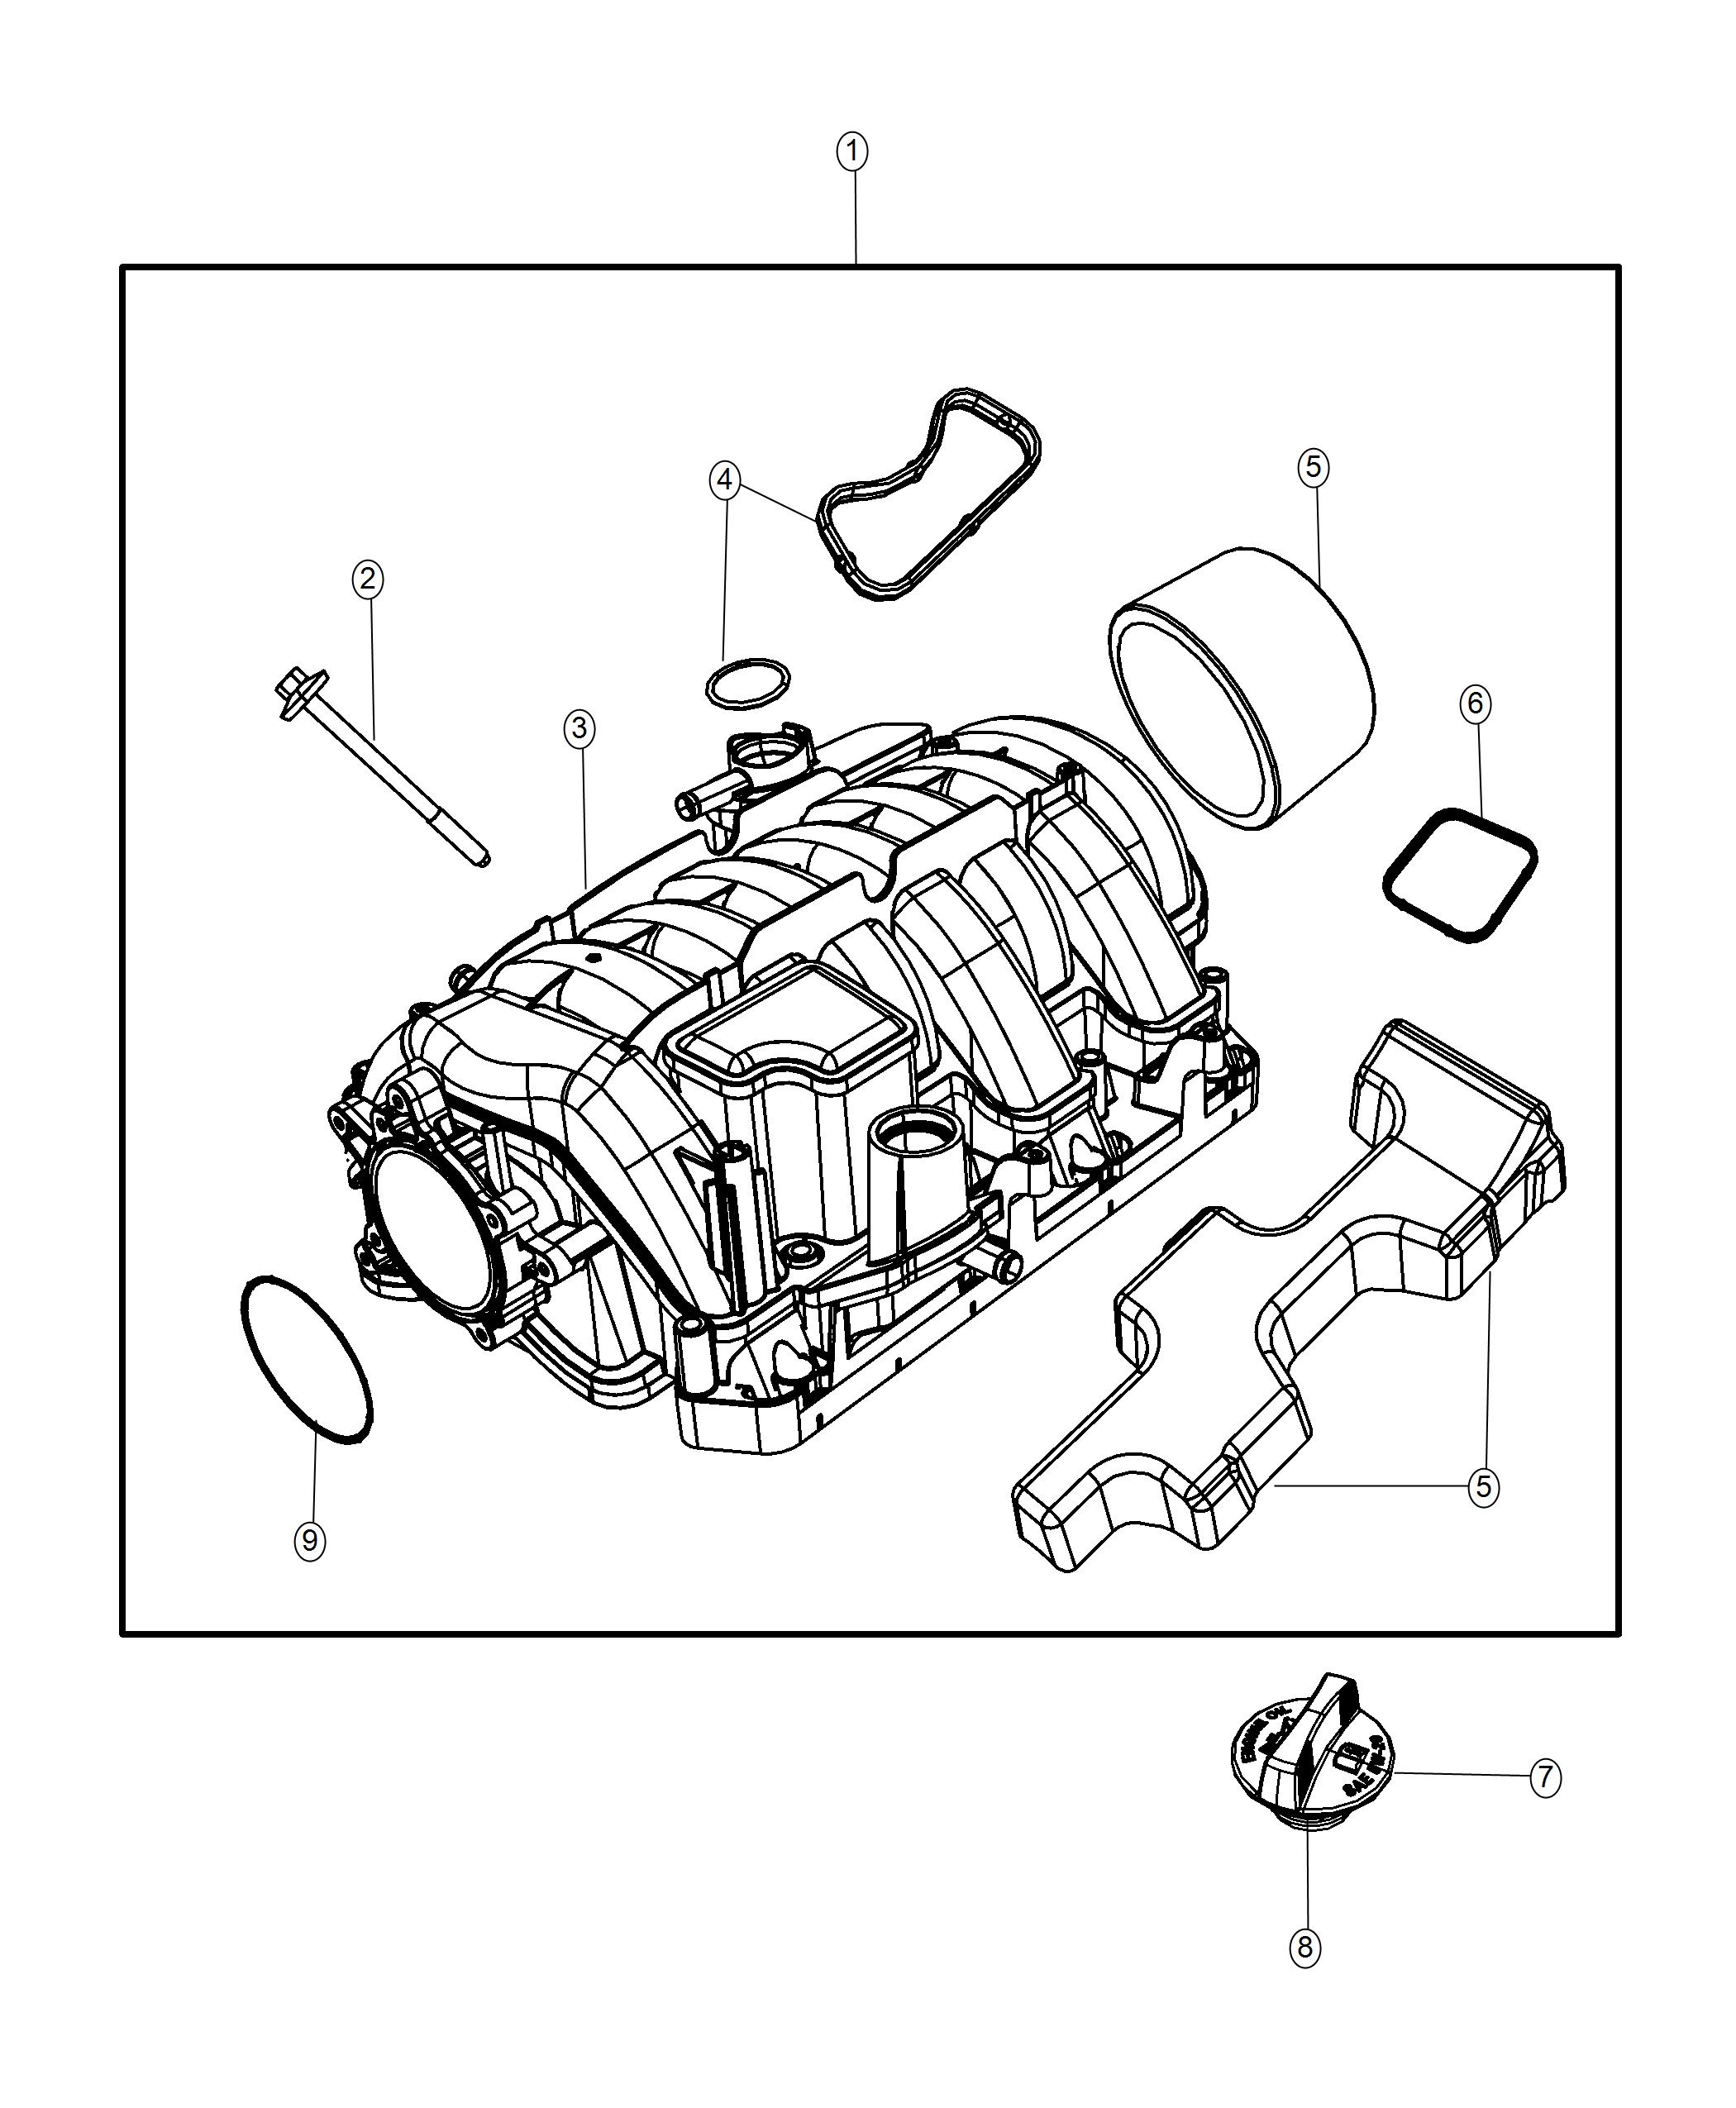 Jeep Grand Cherokee Manifold kit. Engine intake. Mds, ezh